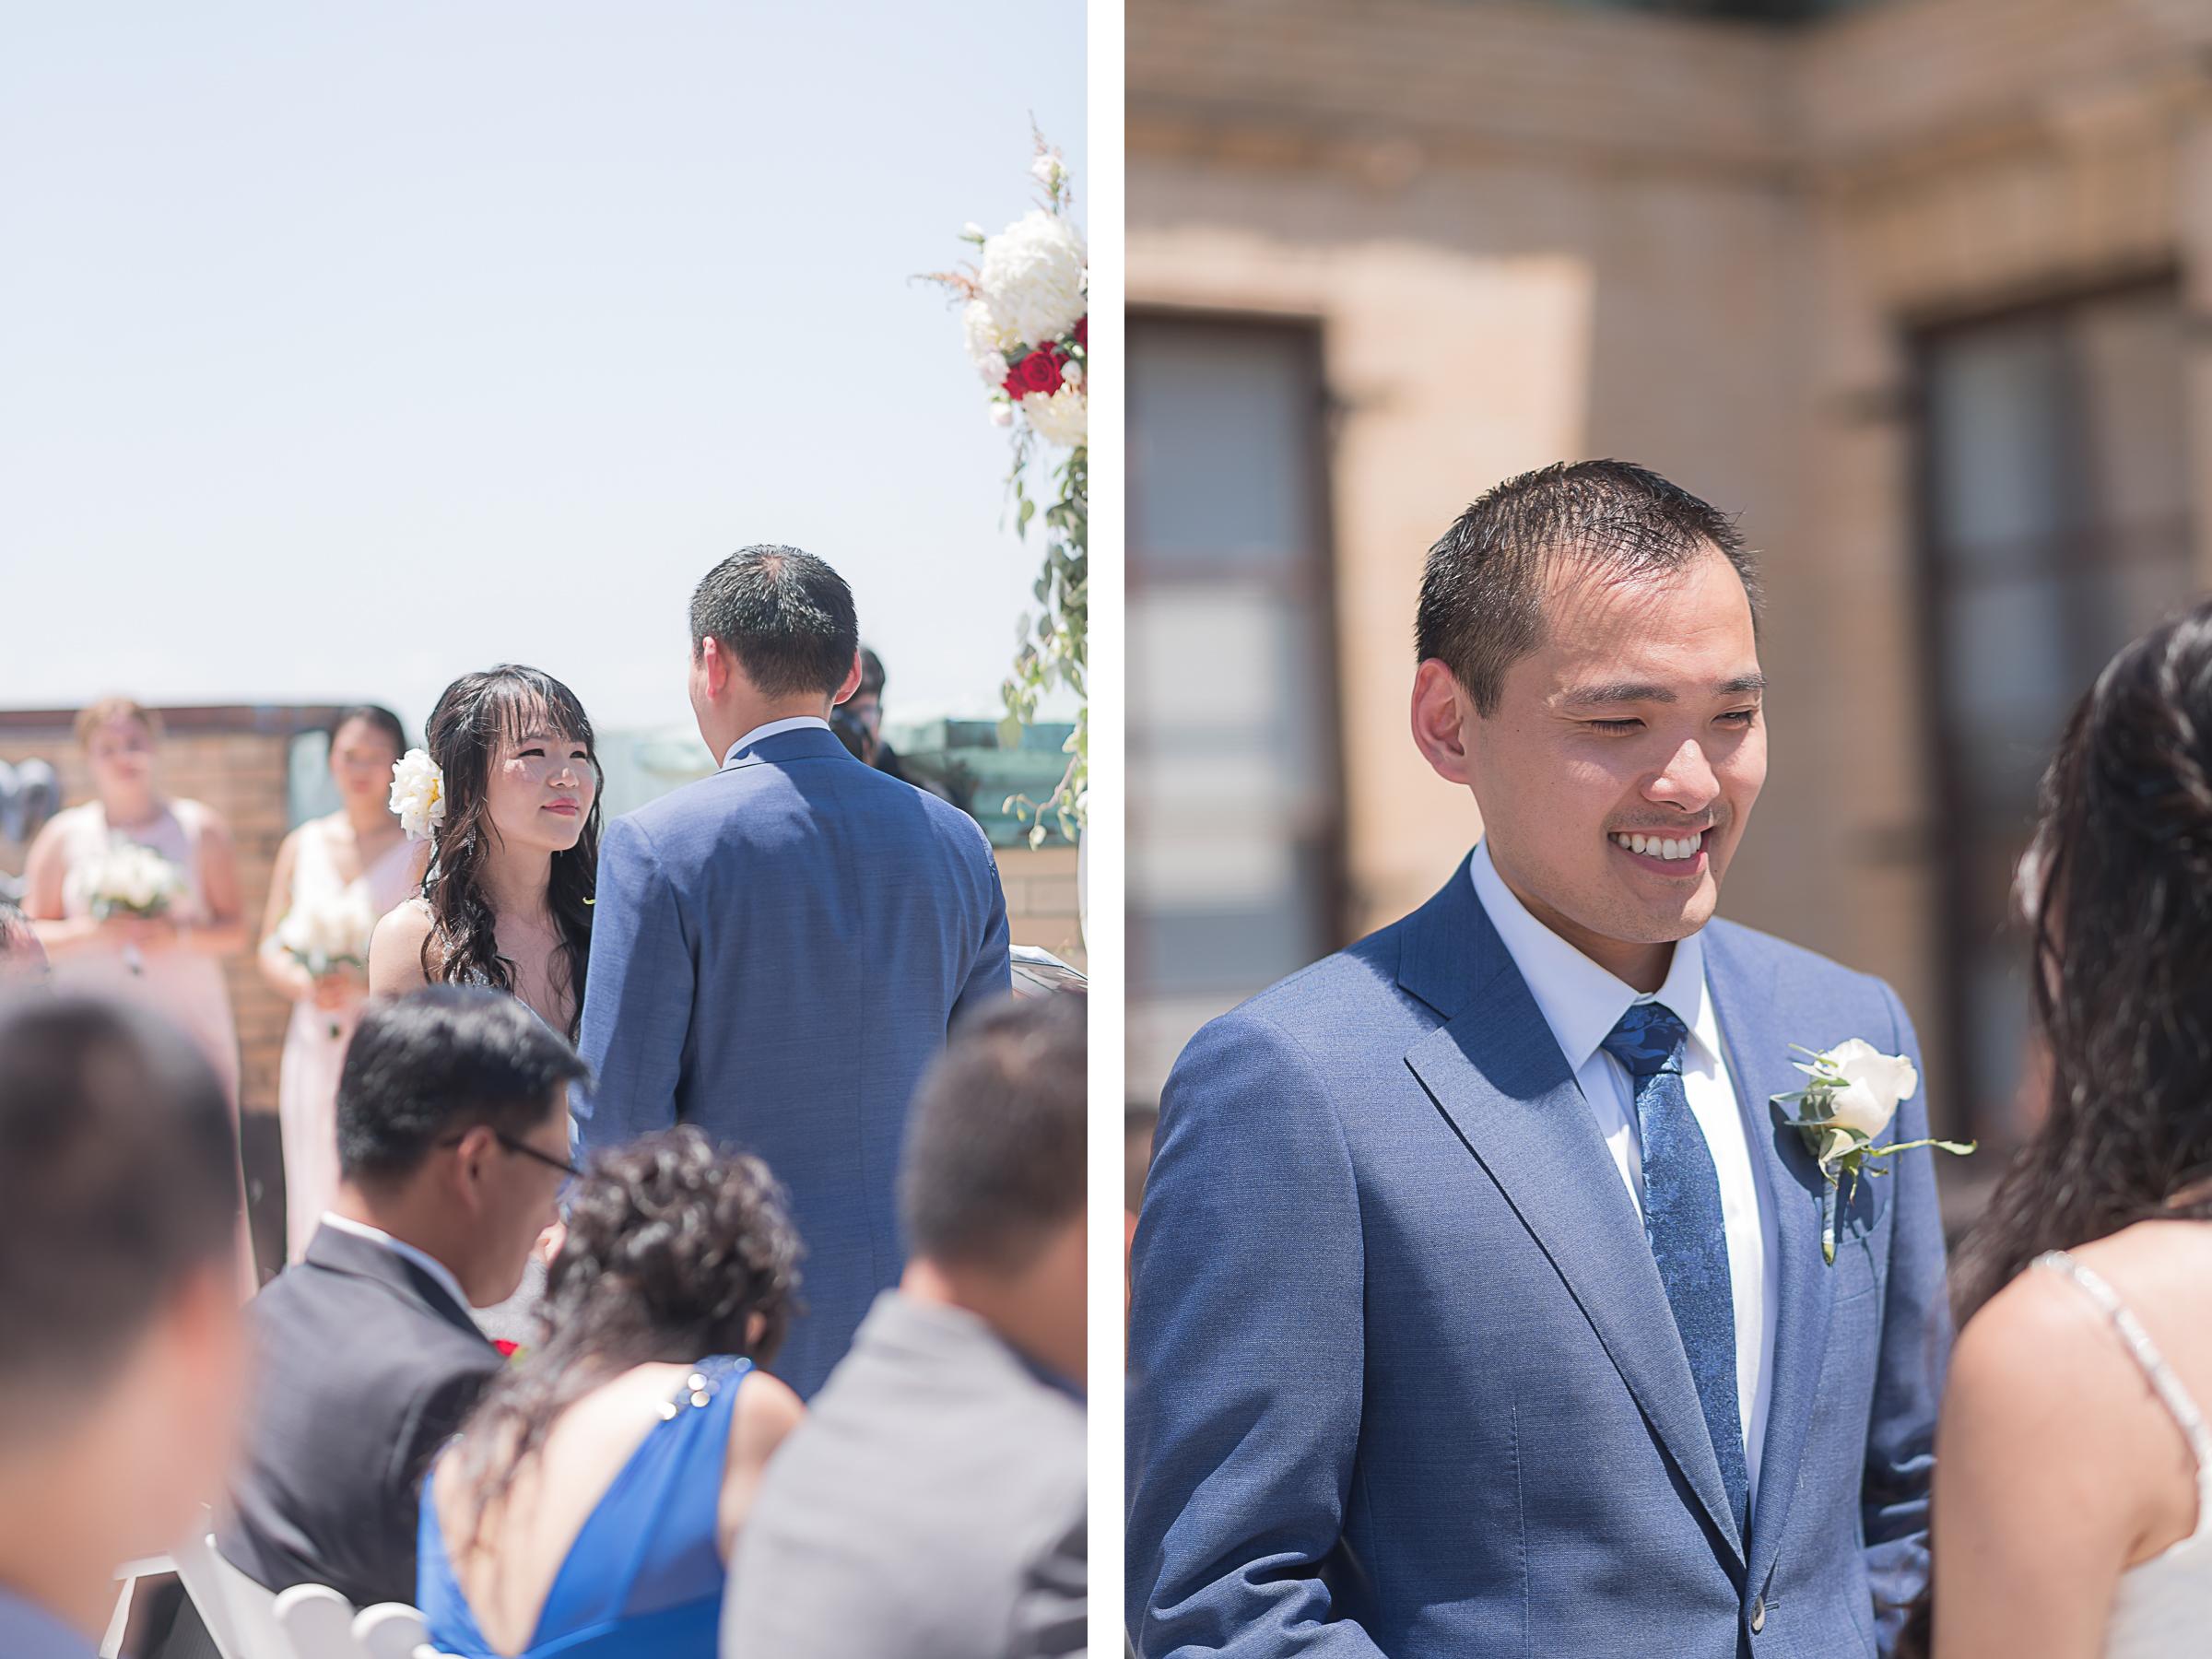 NYC-Ramscale-Wedding-Bride-Groom-Ceremony-2.jpg